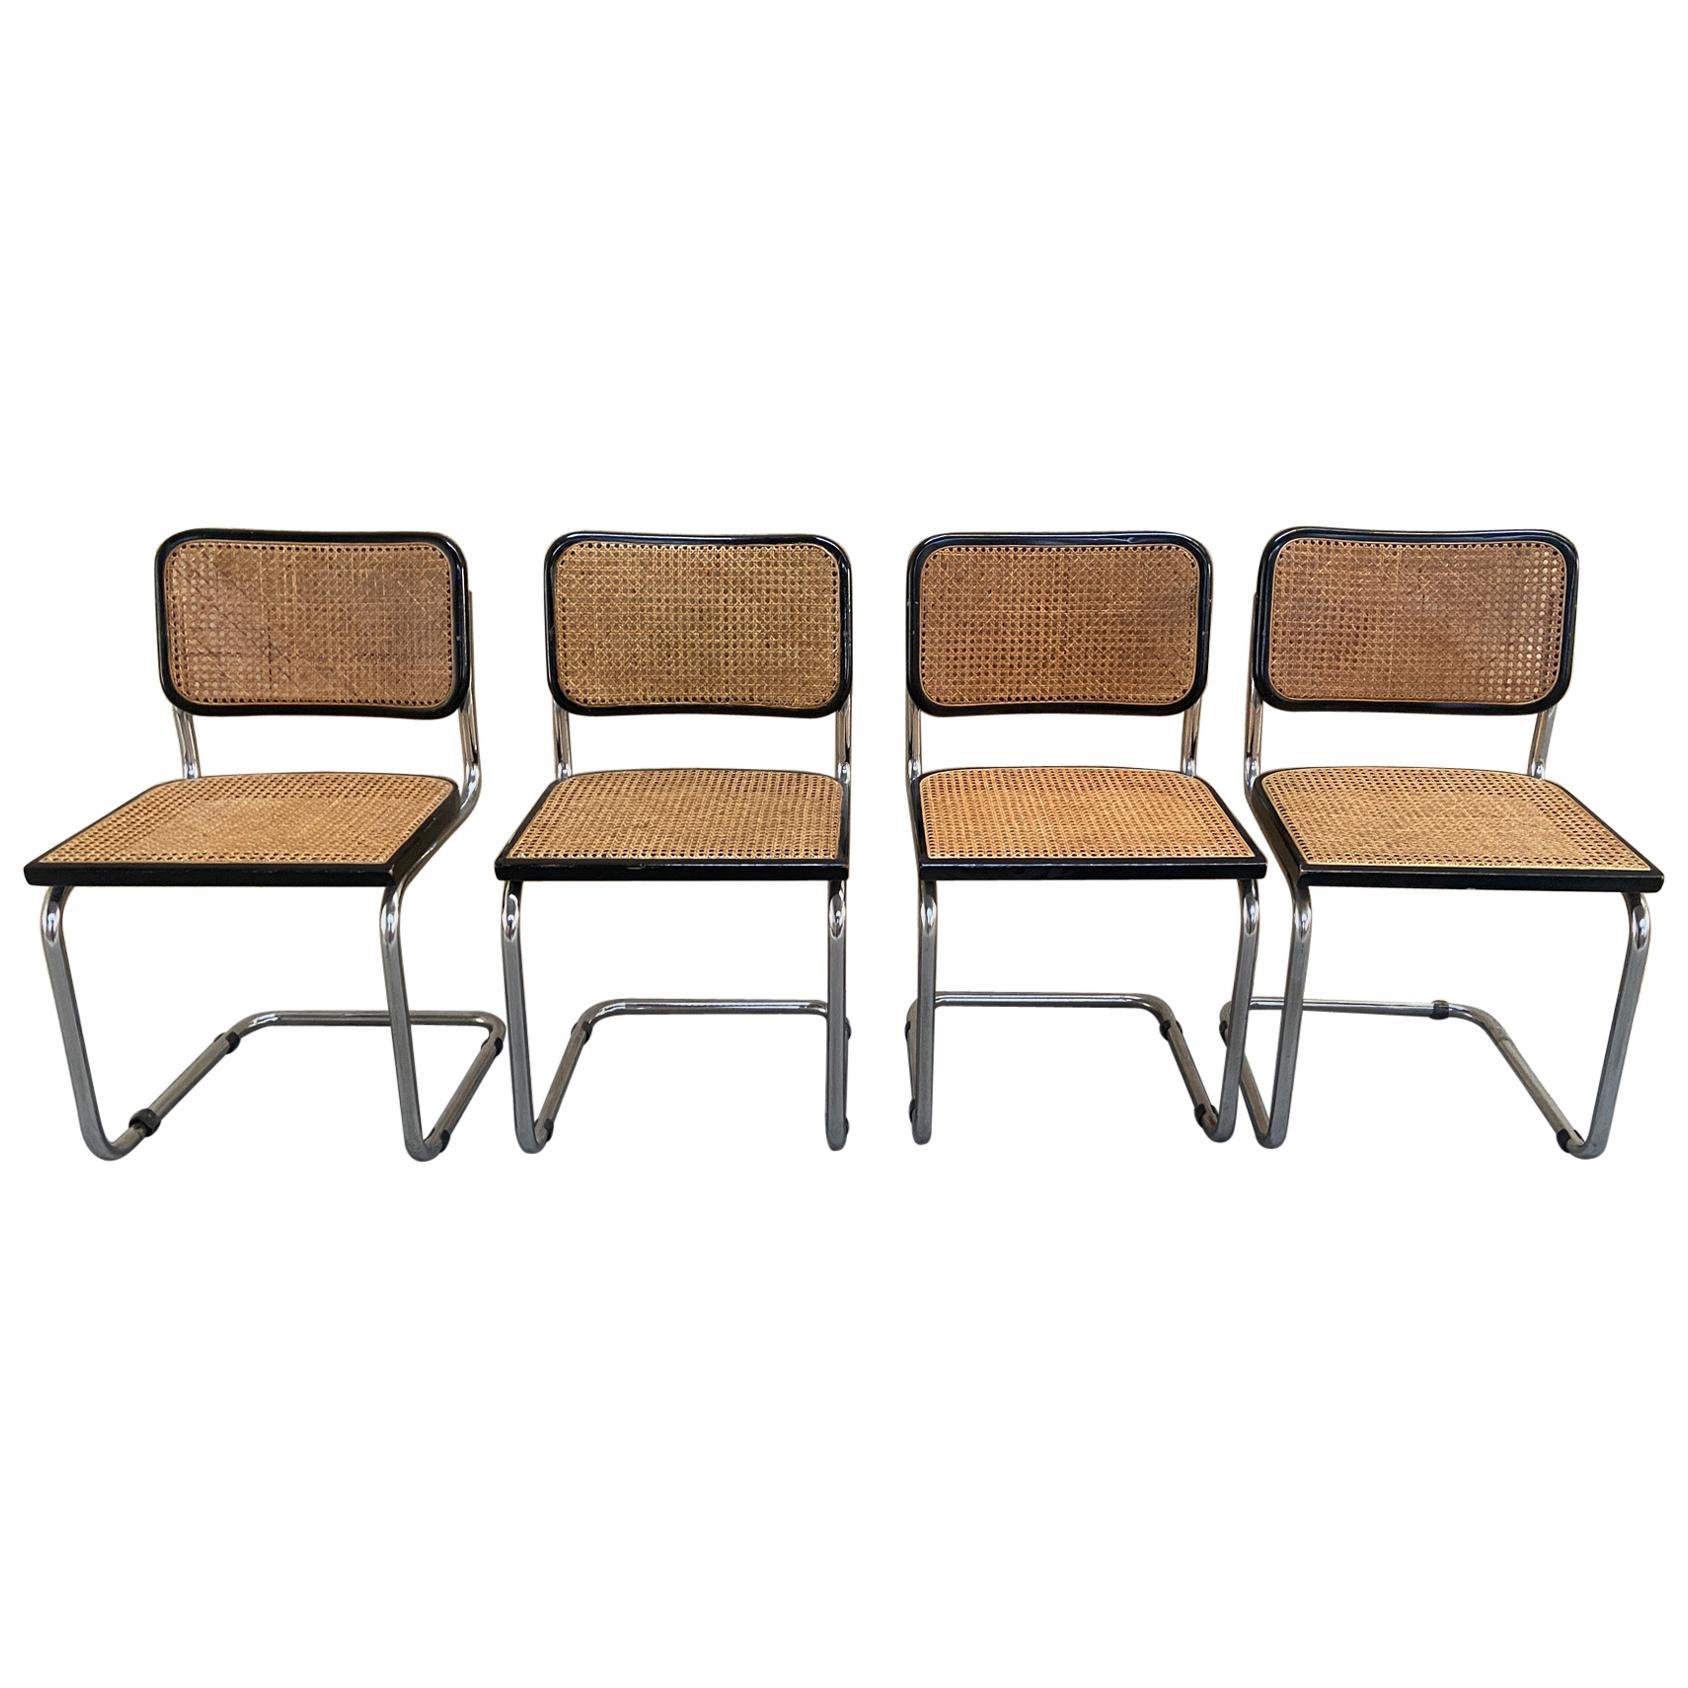 Mid-Century Modern Italian Set of Cesca Chairs by Marcel Breuer, 1970s